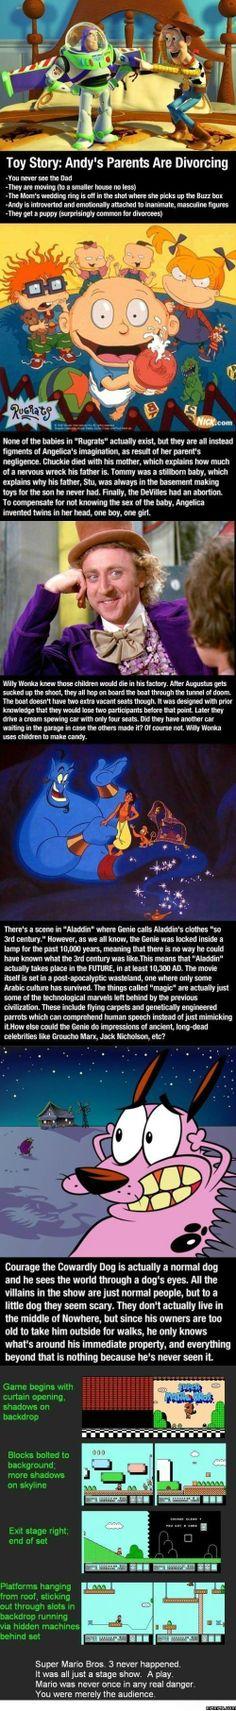 Cartoon theories